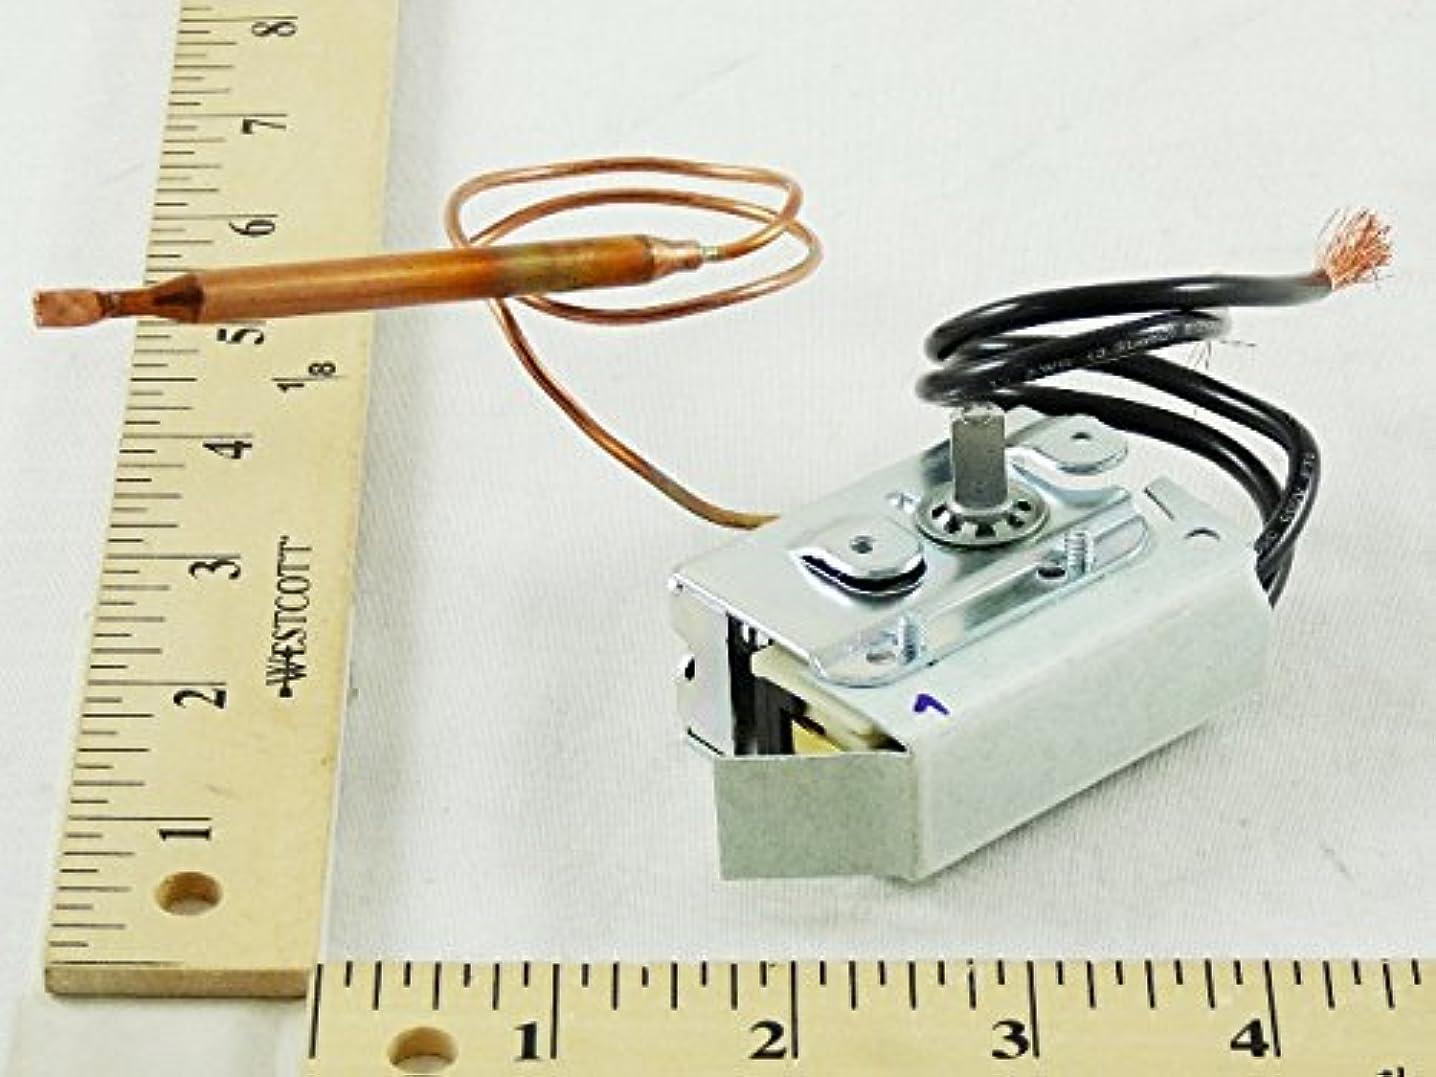 Berko Marley QMark Thermostat 1 Pole L120F # 410127001